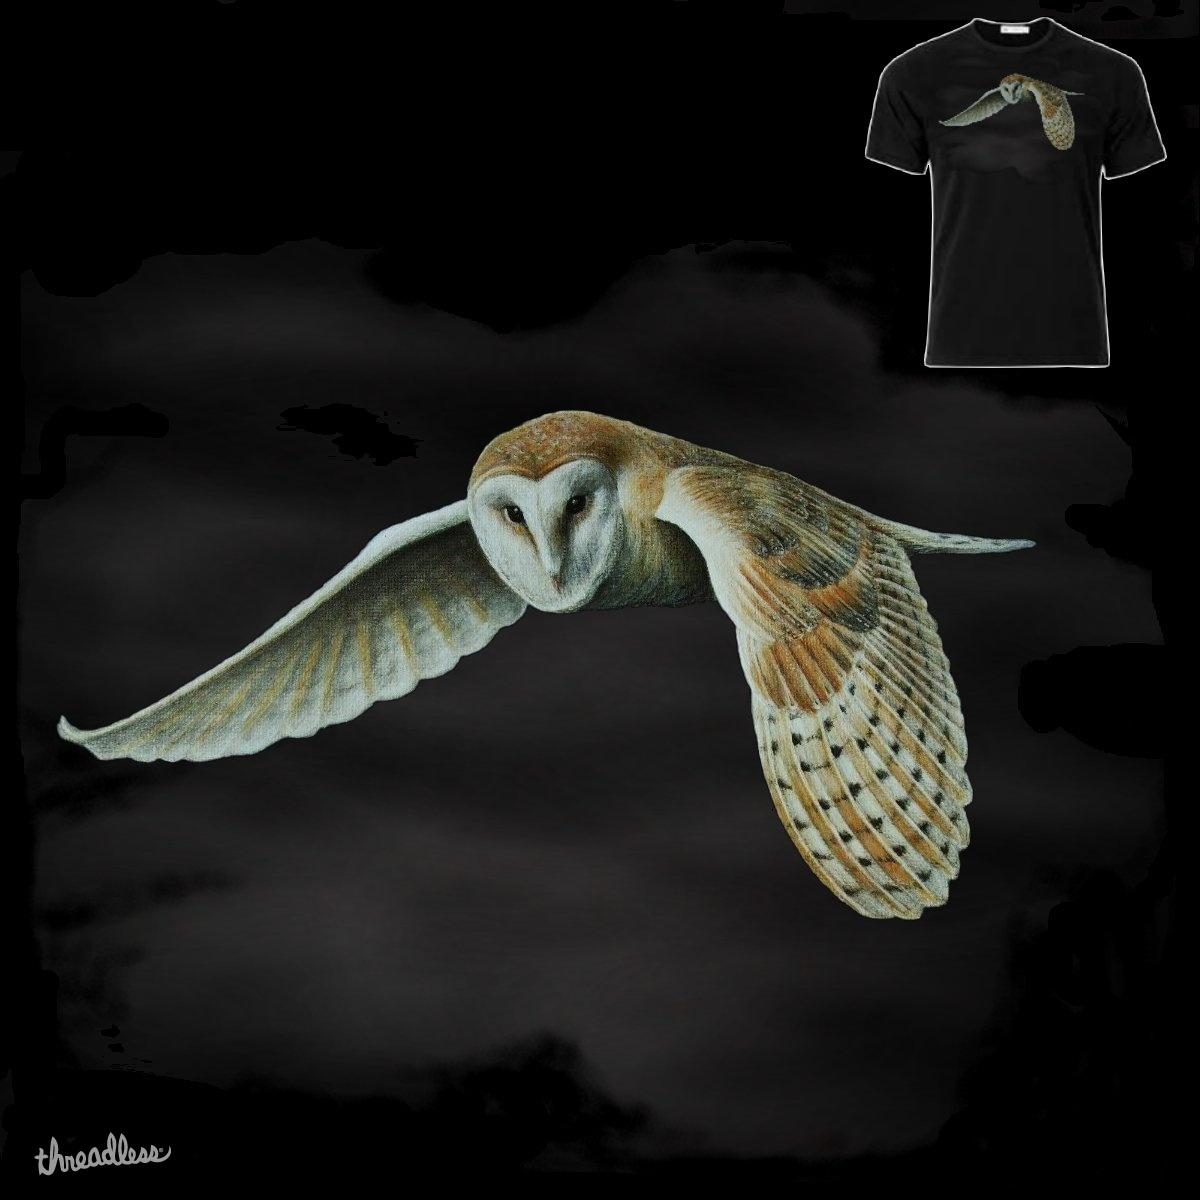 Barn Owl by Paparaw on Threadless